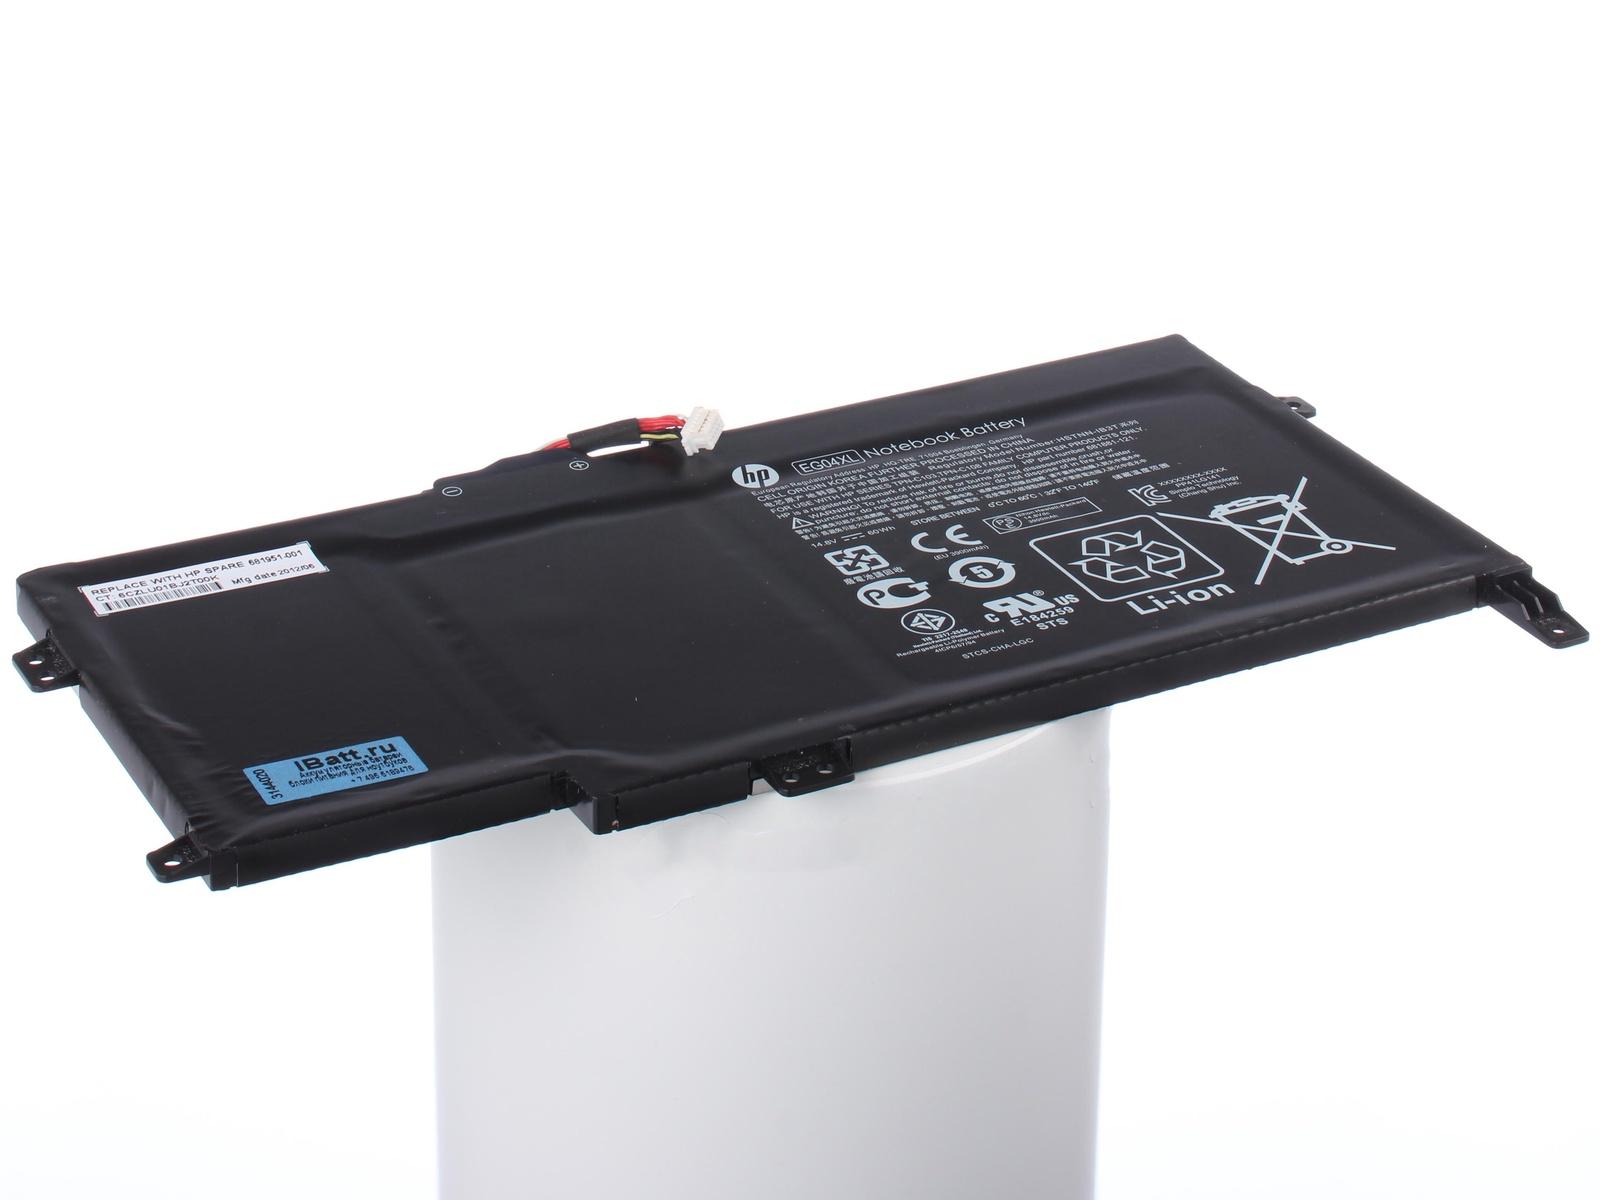 Аккумулятор для ноутбука iBatt для HP-Compaq Envy 6-1151er, ENVY Sleekbook 6-1252er, Envy 6-1155er, Envy 6-1054er, ENVY Ultrabook 6-1254er, Envy 6-1152er, Envy 6-1055er, ENVY Sleekbook 6-1151er, ENVY Sleekbook 6-1101er цены